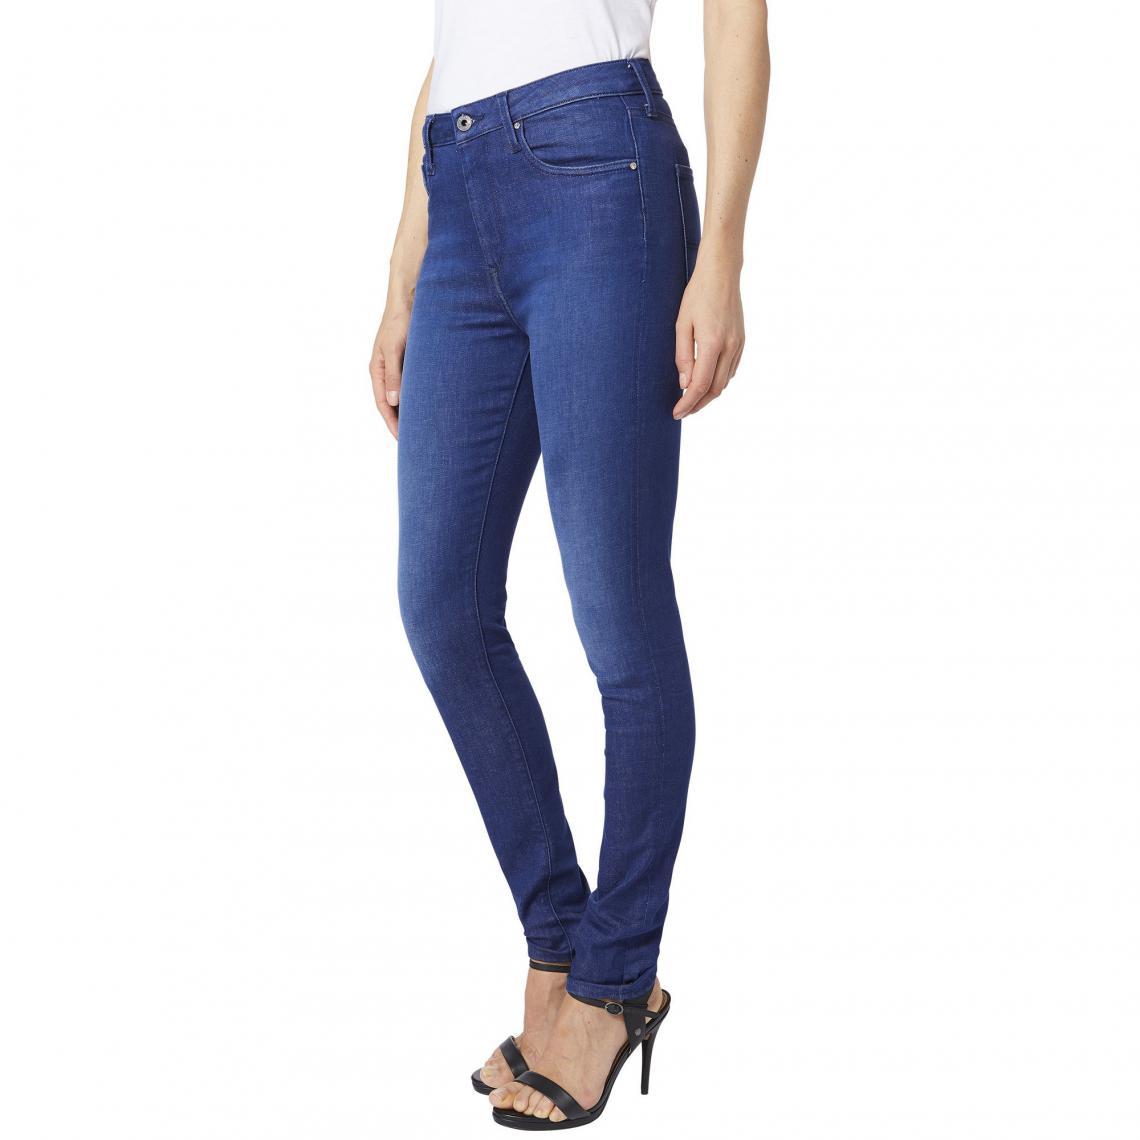 2d5533b5900 Jean skinny L32 Regent femme Pepe Jean - Denim Brut Pepe Jeans Femme